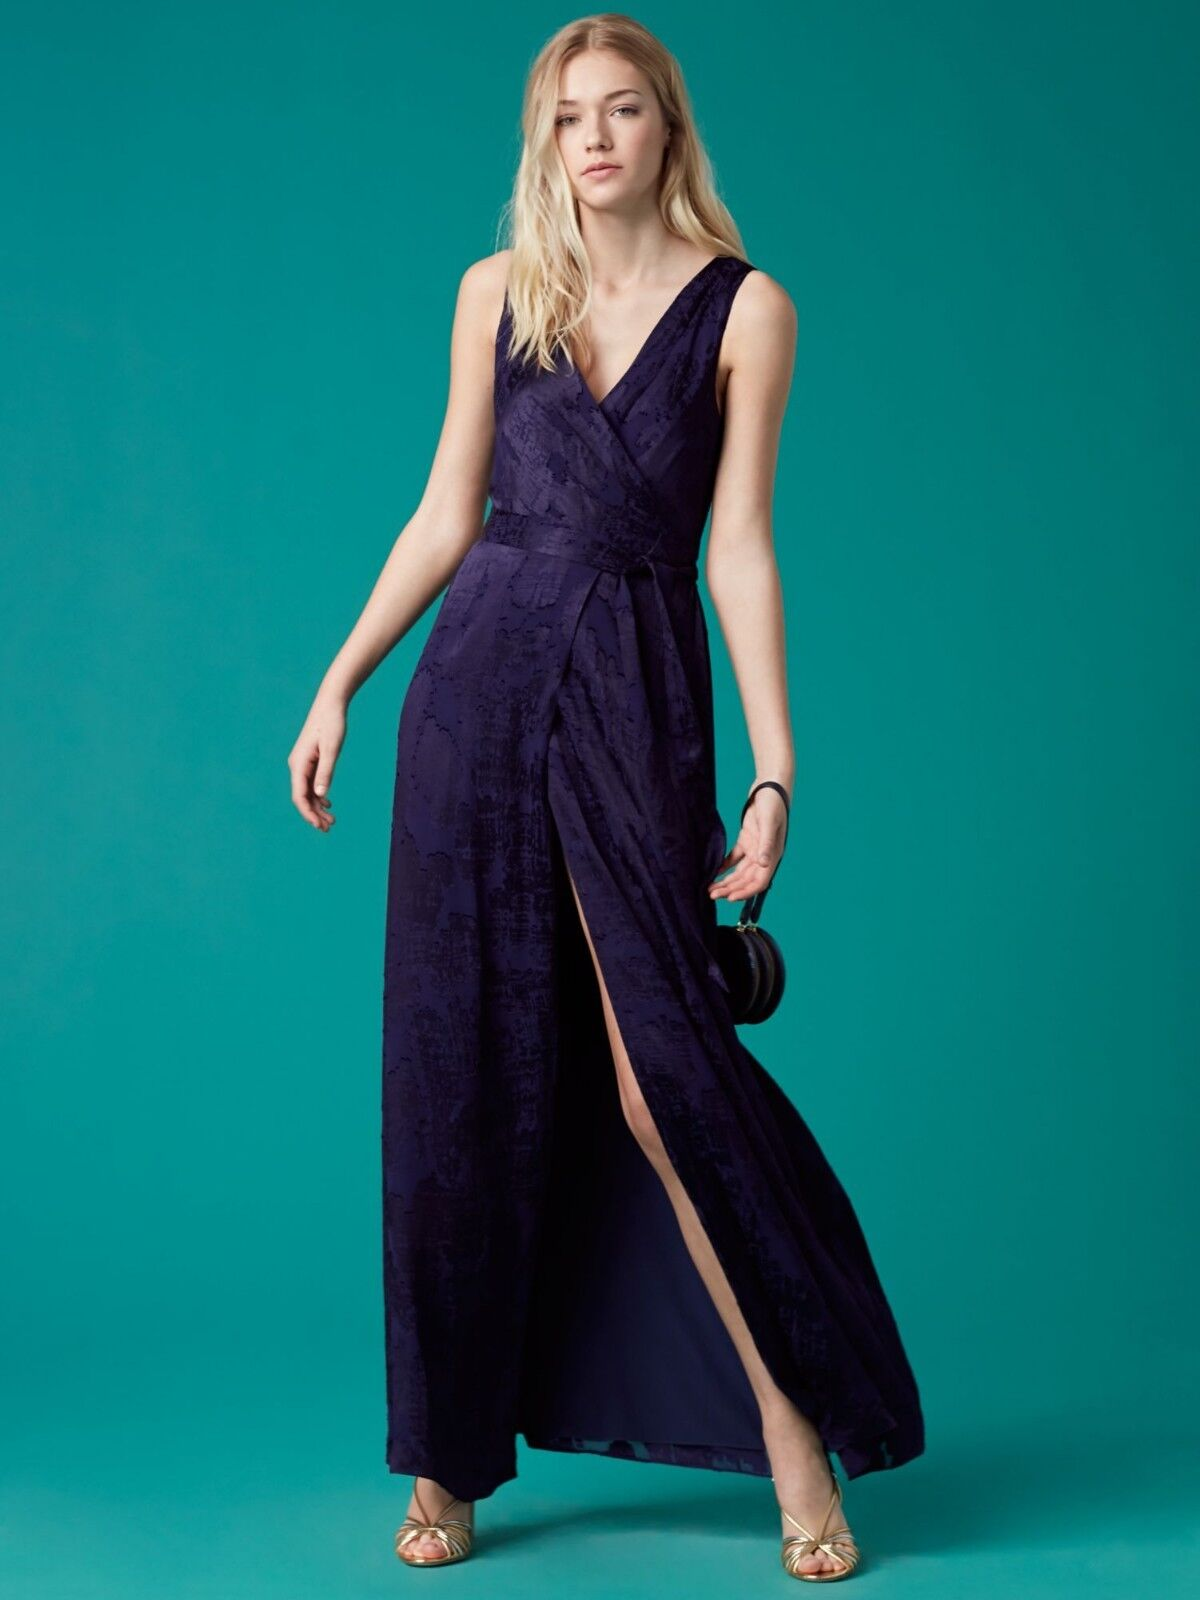 Diane von Furstenberg Sleeveless Floor-Length Wrap Dress sz 4 nwt 10528DVF